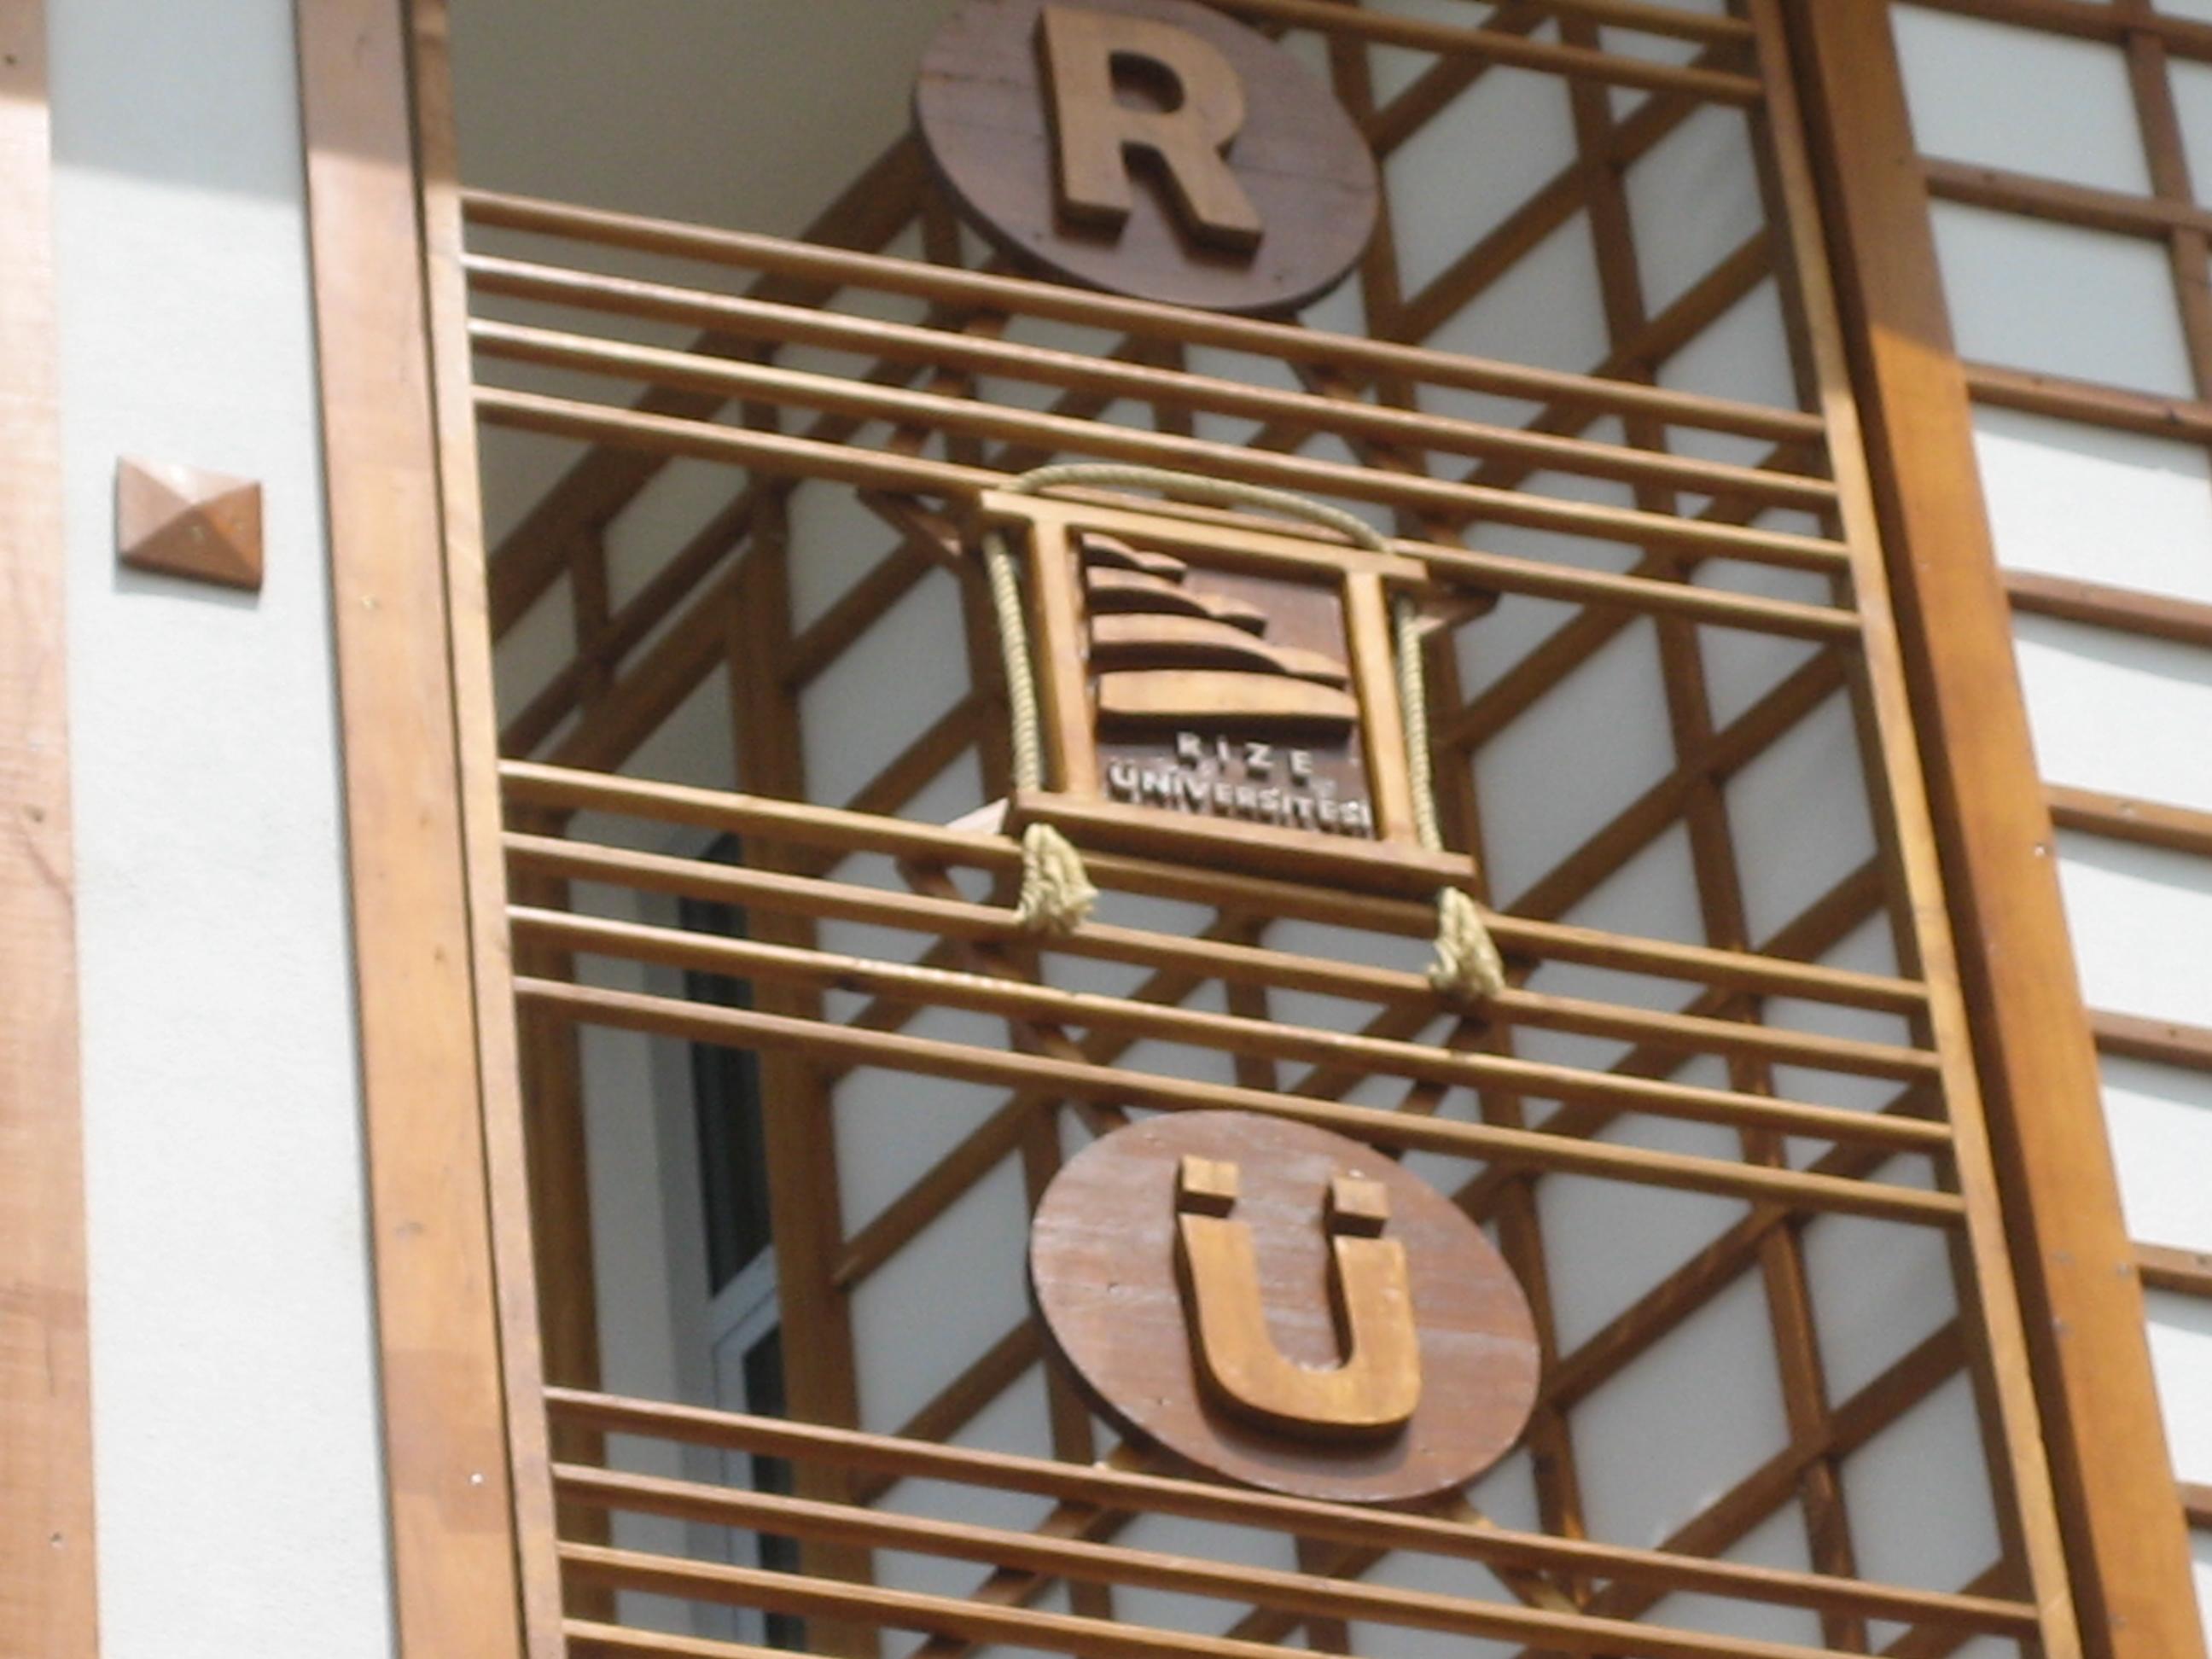 rize-universitesi1